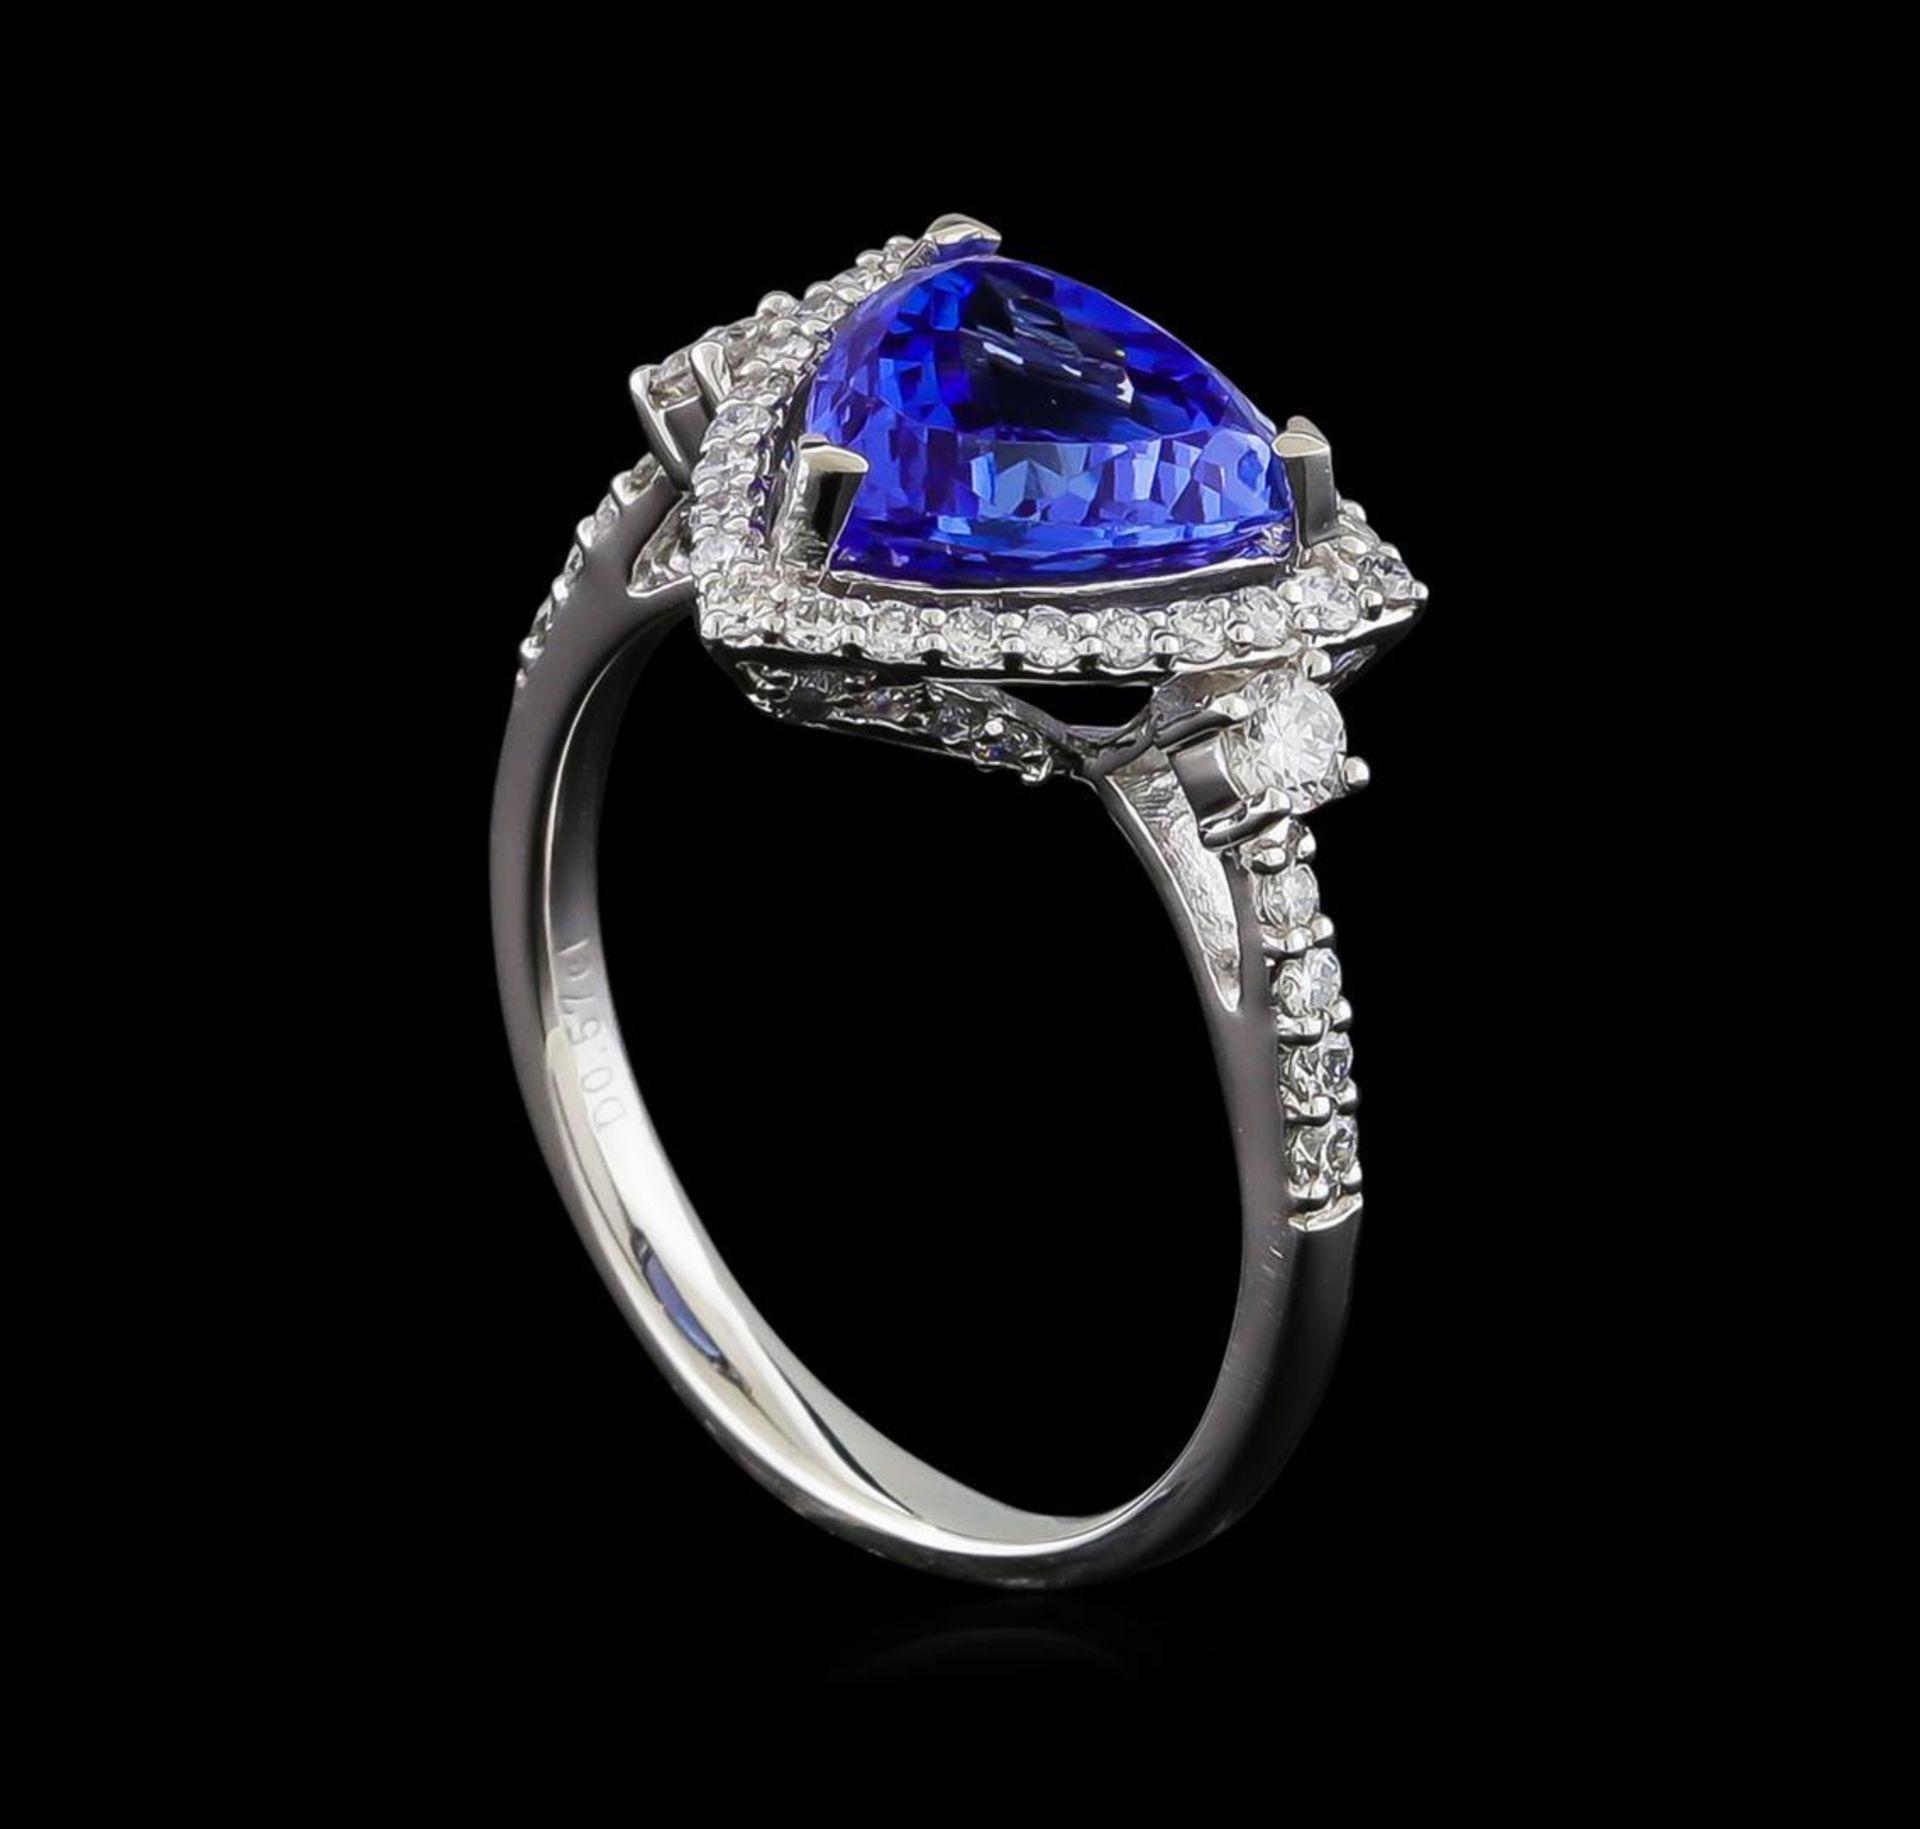 2.46 ctw Tanzanite and Diamond Ring - Platinum - Image 4 of 5